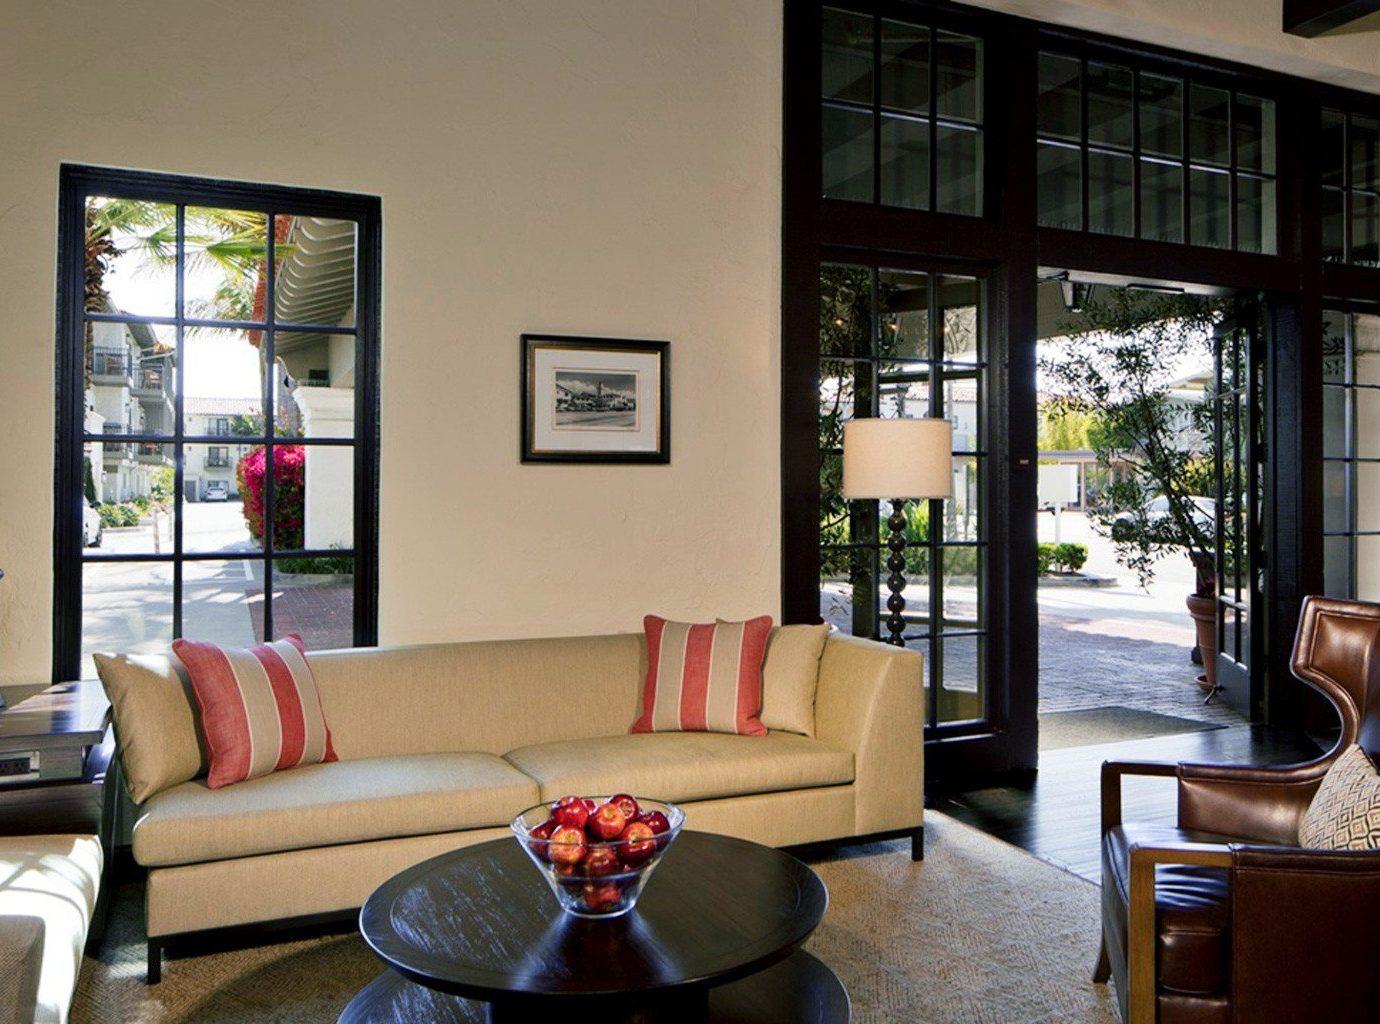 Lounge Luxury Modern sofa living room property home condominium nice loft cottage leather